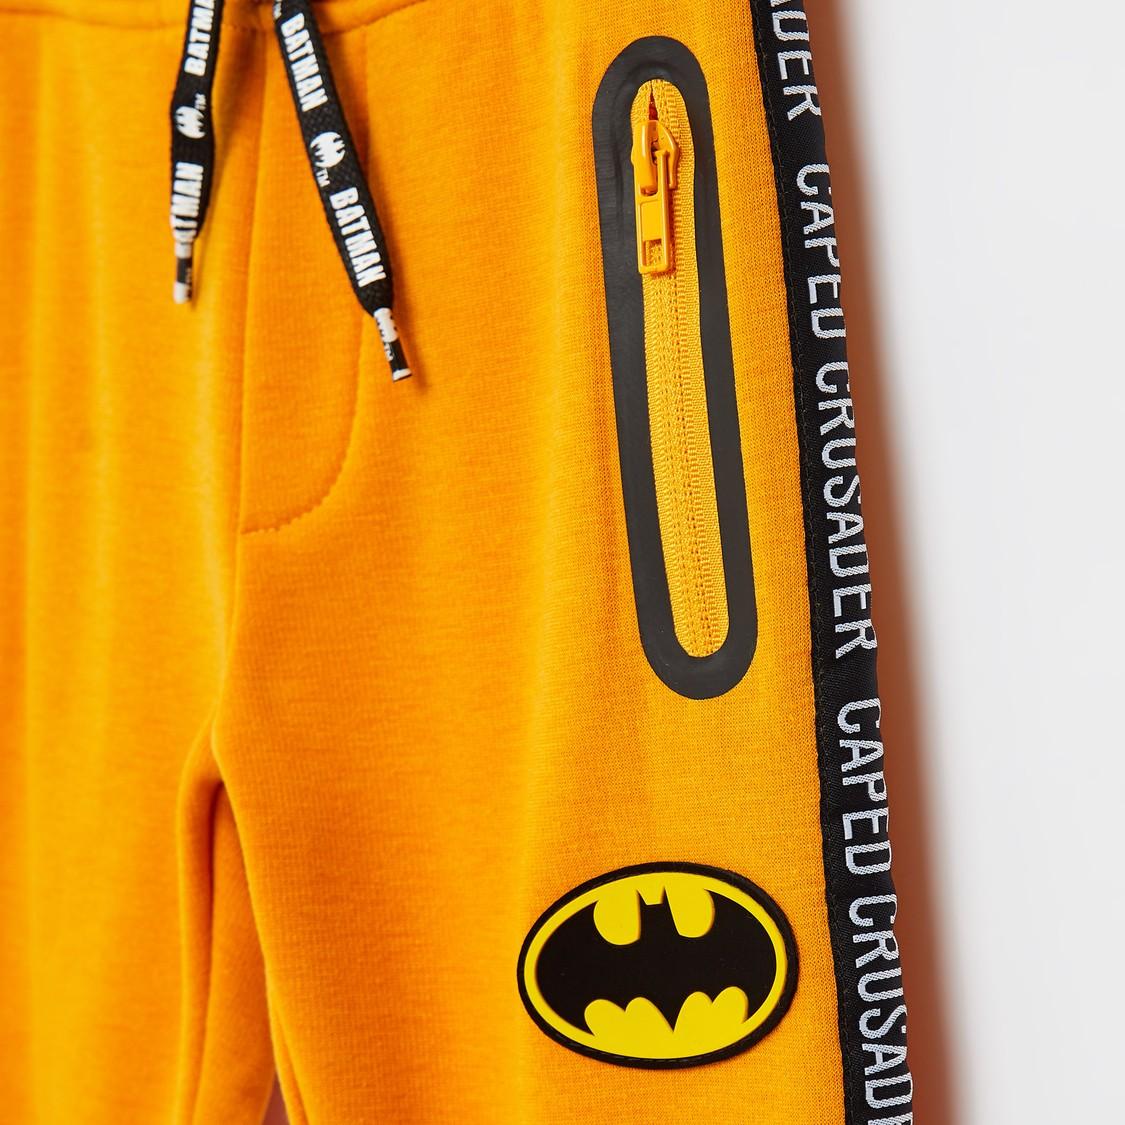 Full Length Batman Print Joggers with Drawstring Closure and Pockets